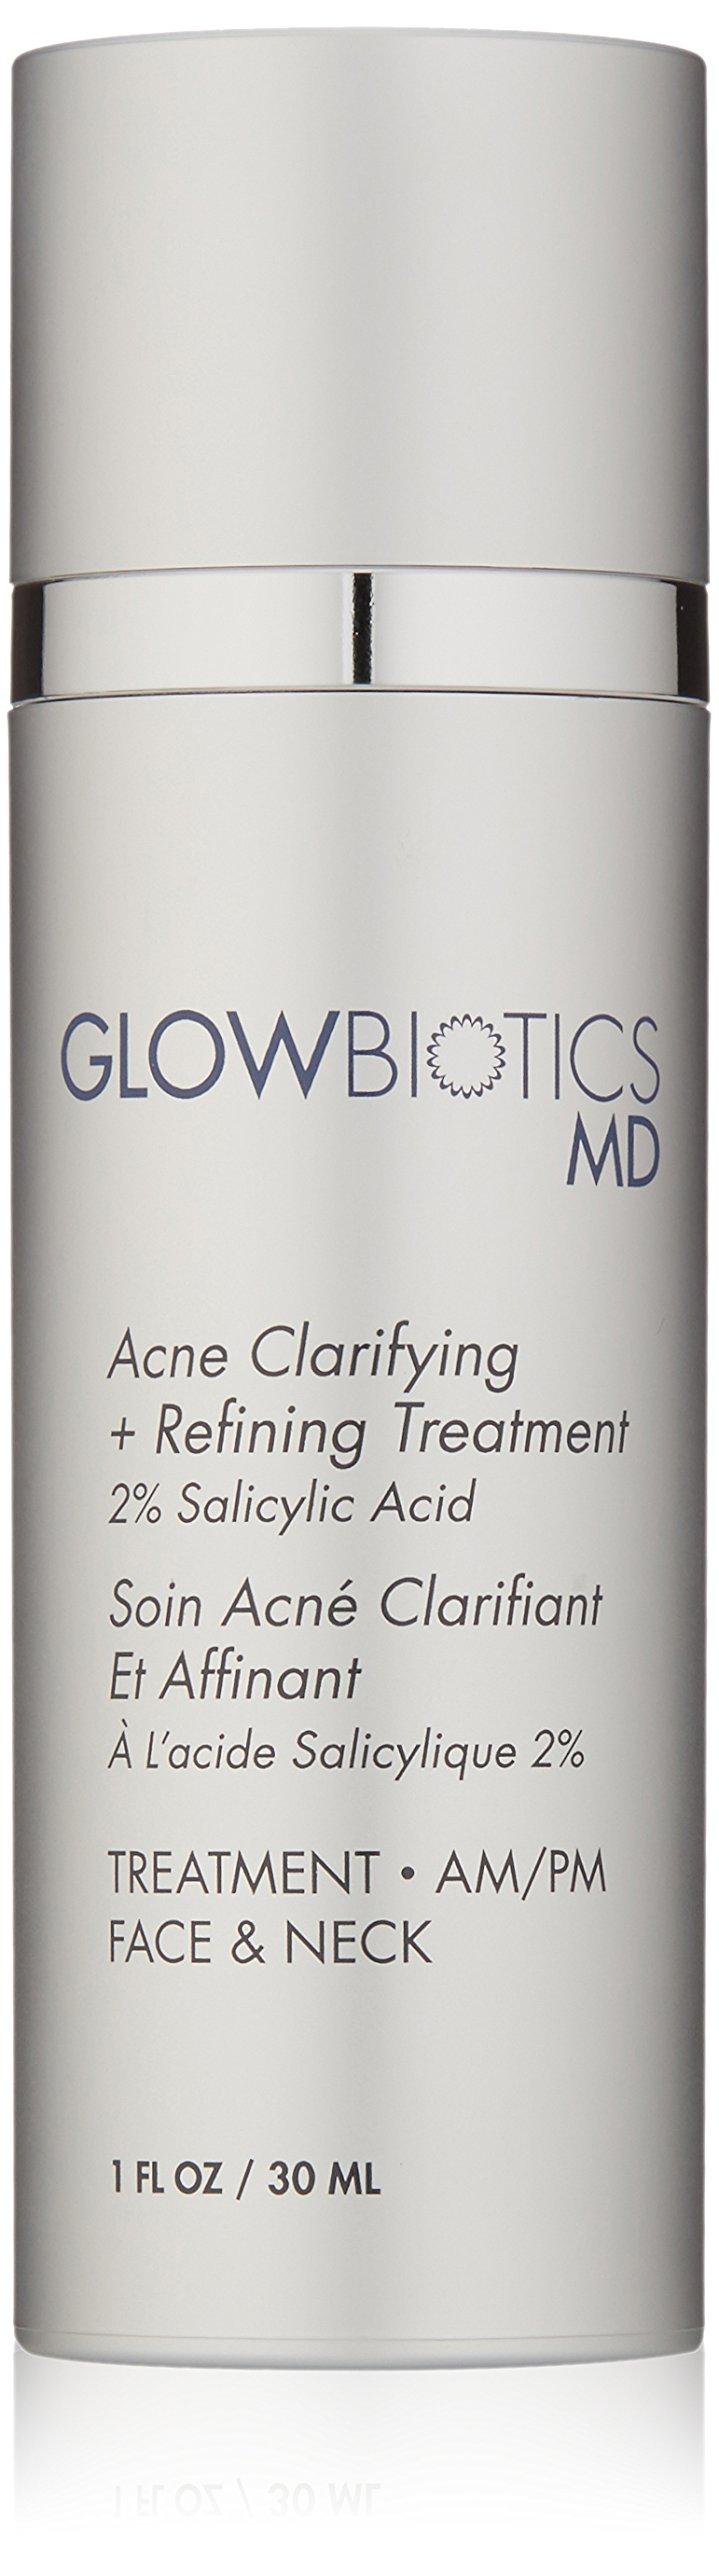 Glowbiotics MD Probiotic Acne Clarifying + Refining Treatment (2% Salicylic Acid), 1oz